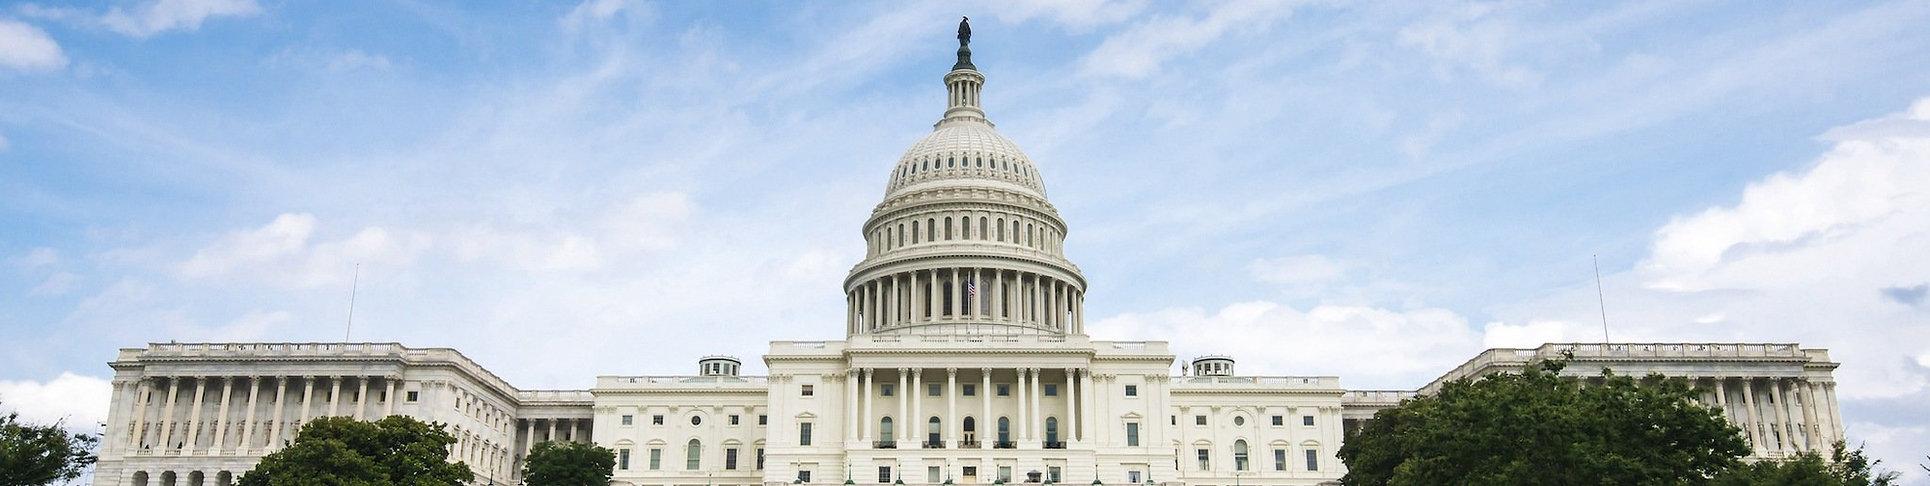 Washington-DC-Full-Banner-Image-copy.jpg